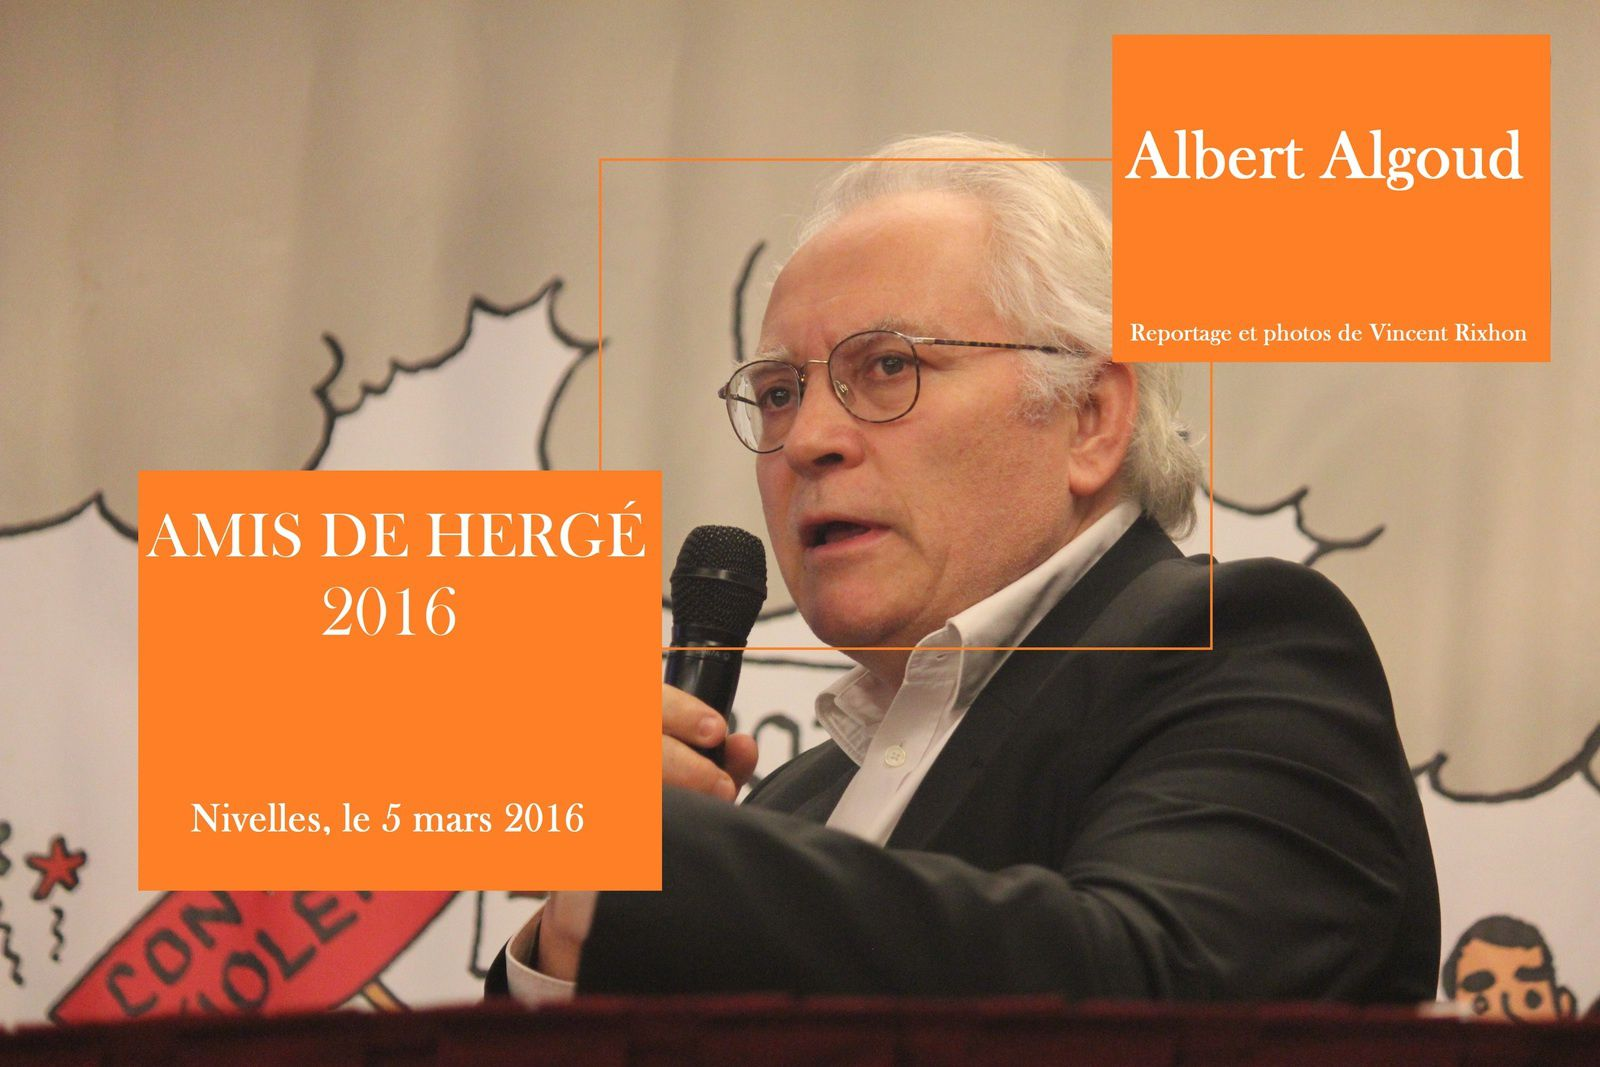 Albert Algoud aux AMIS DE HERGE 2016